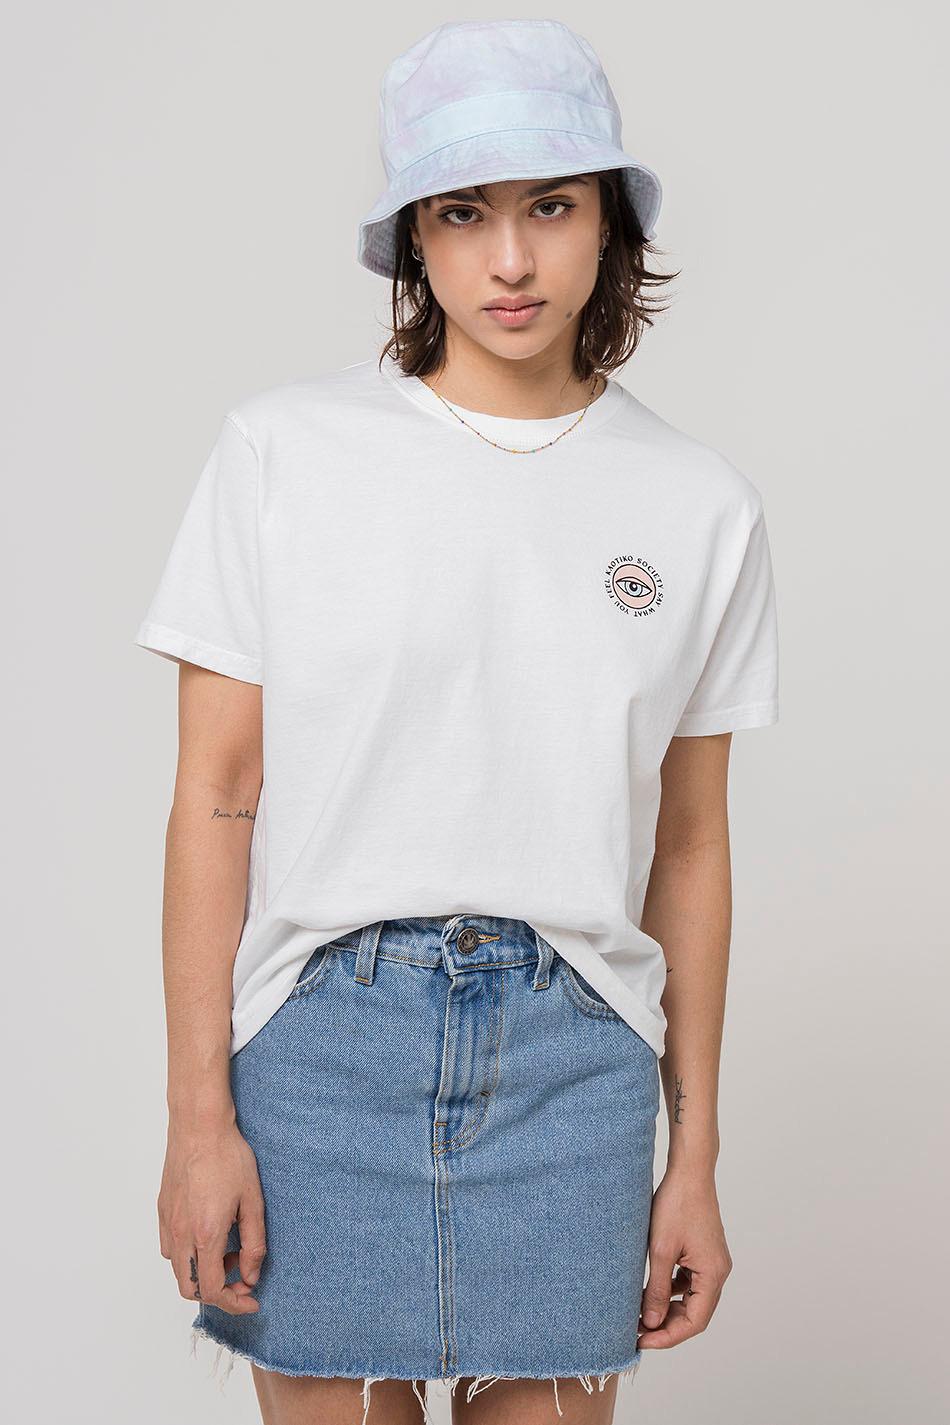 Camiseta Eye Say Blanca